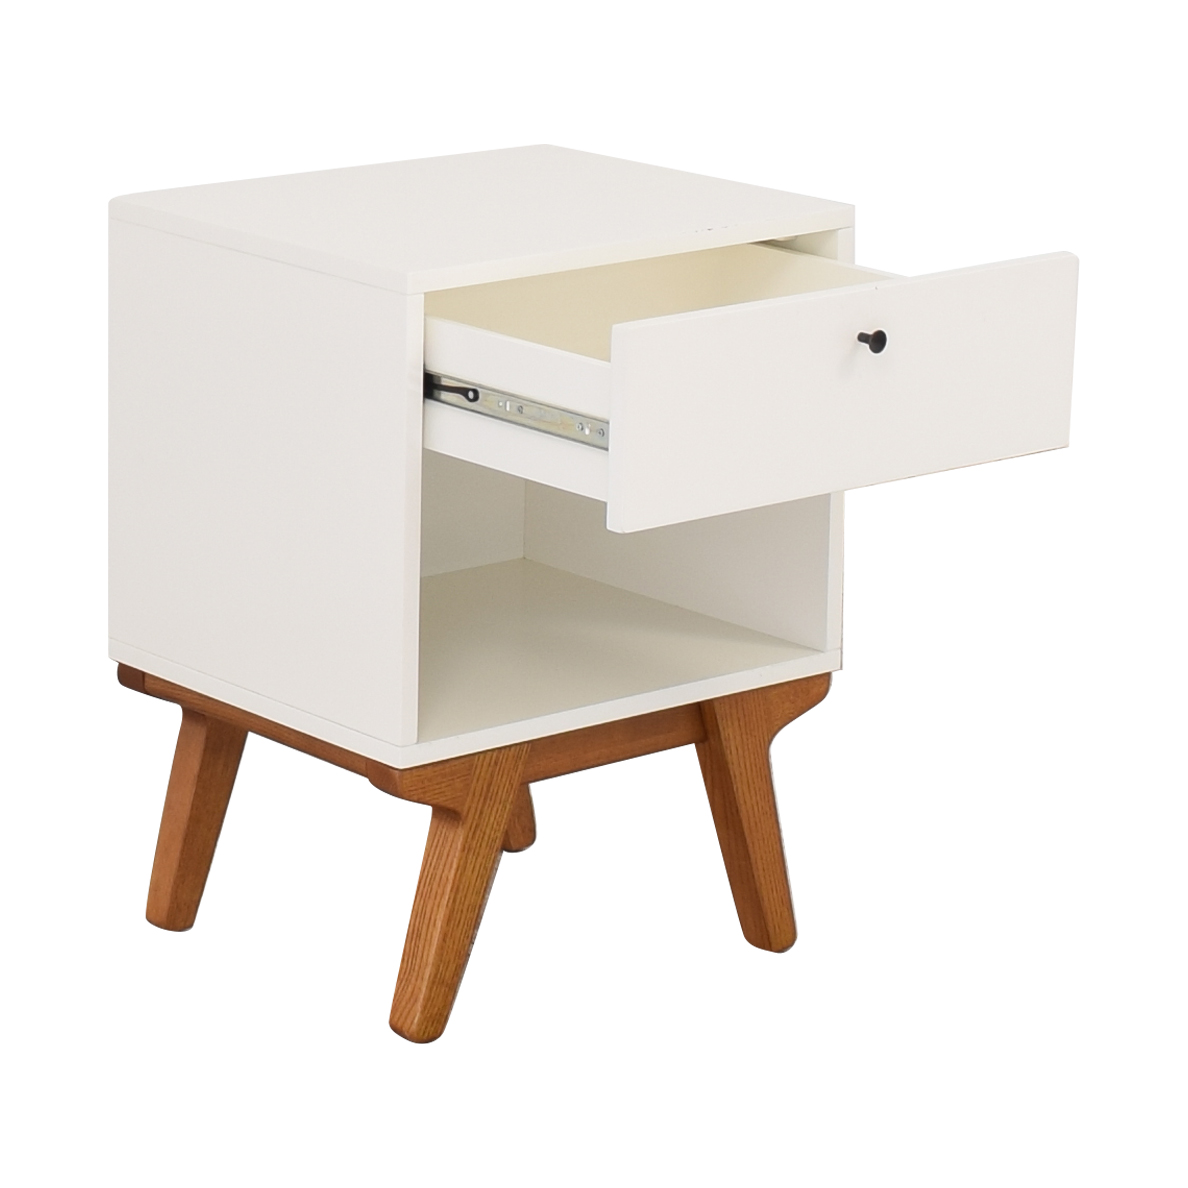 West Elm Modern Nightstand / Tables